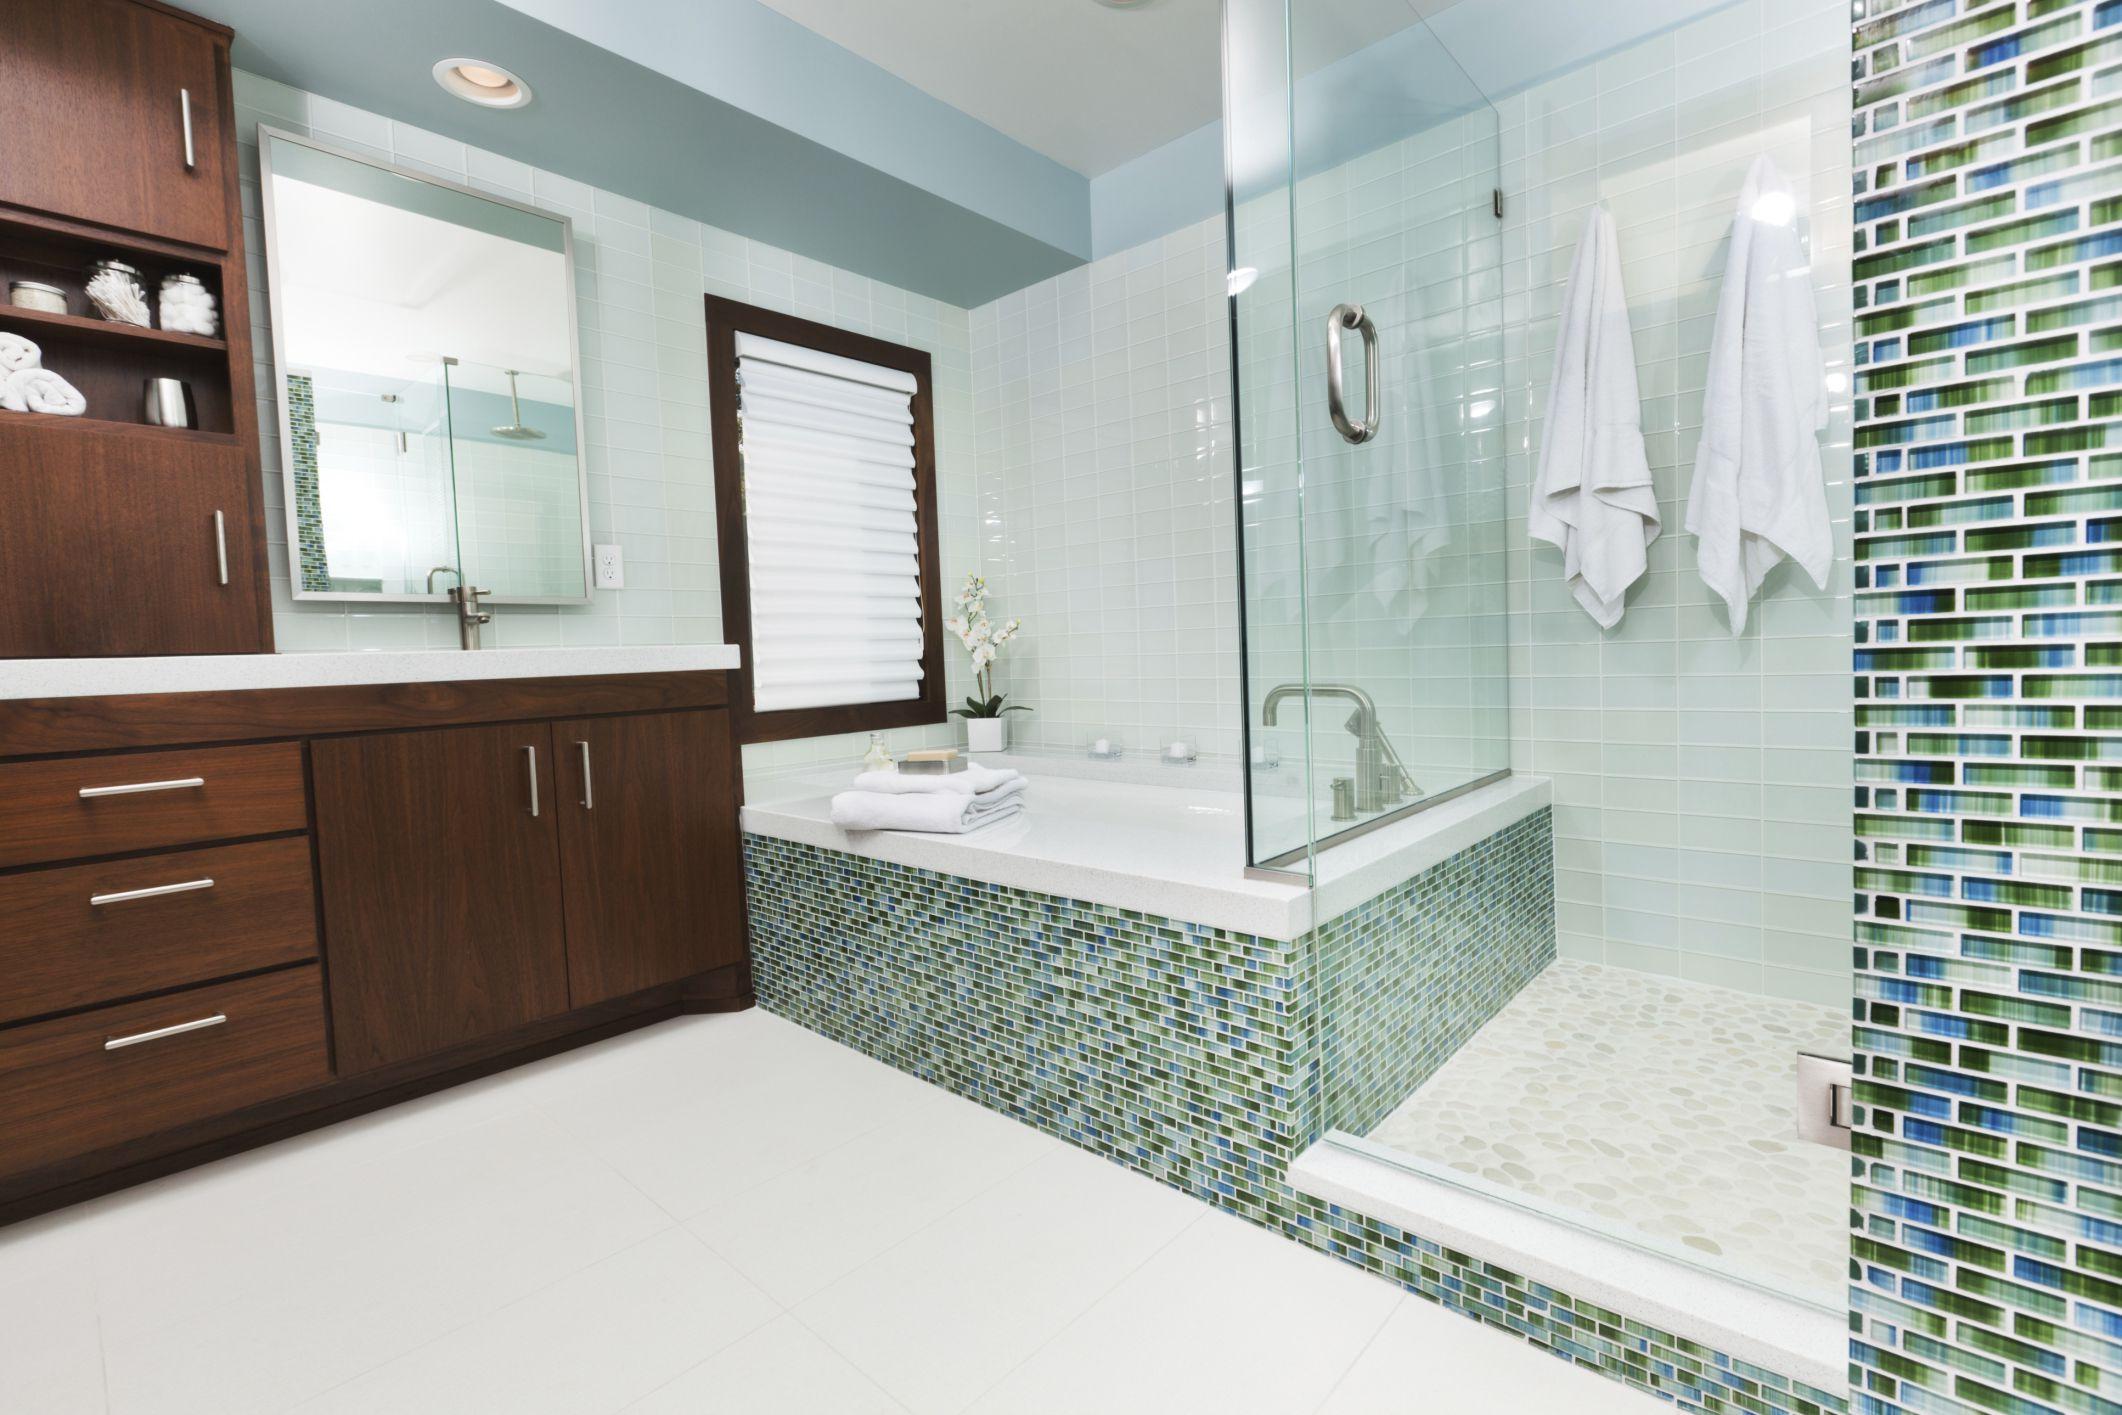 Green tiles for bathroom - Green Tiles For Bathroom 54